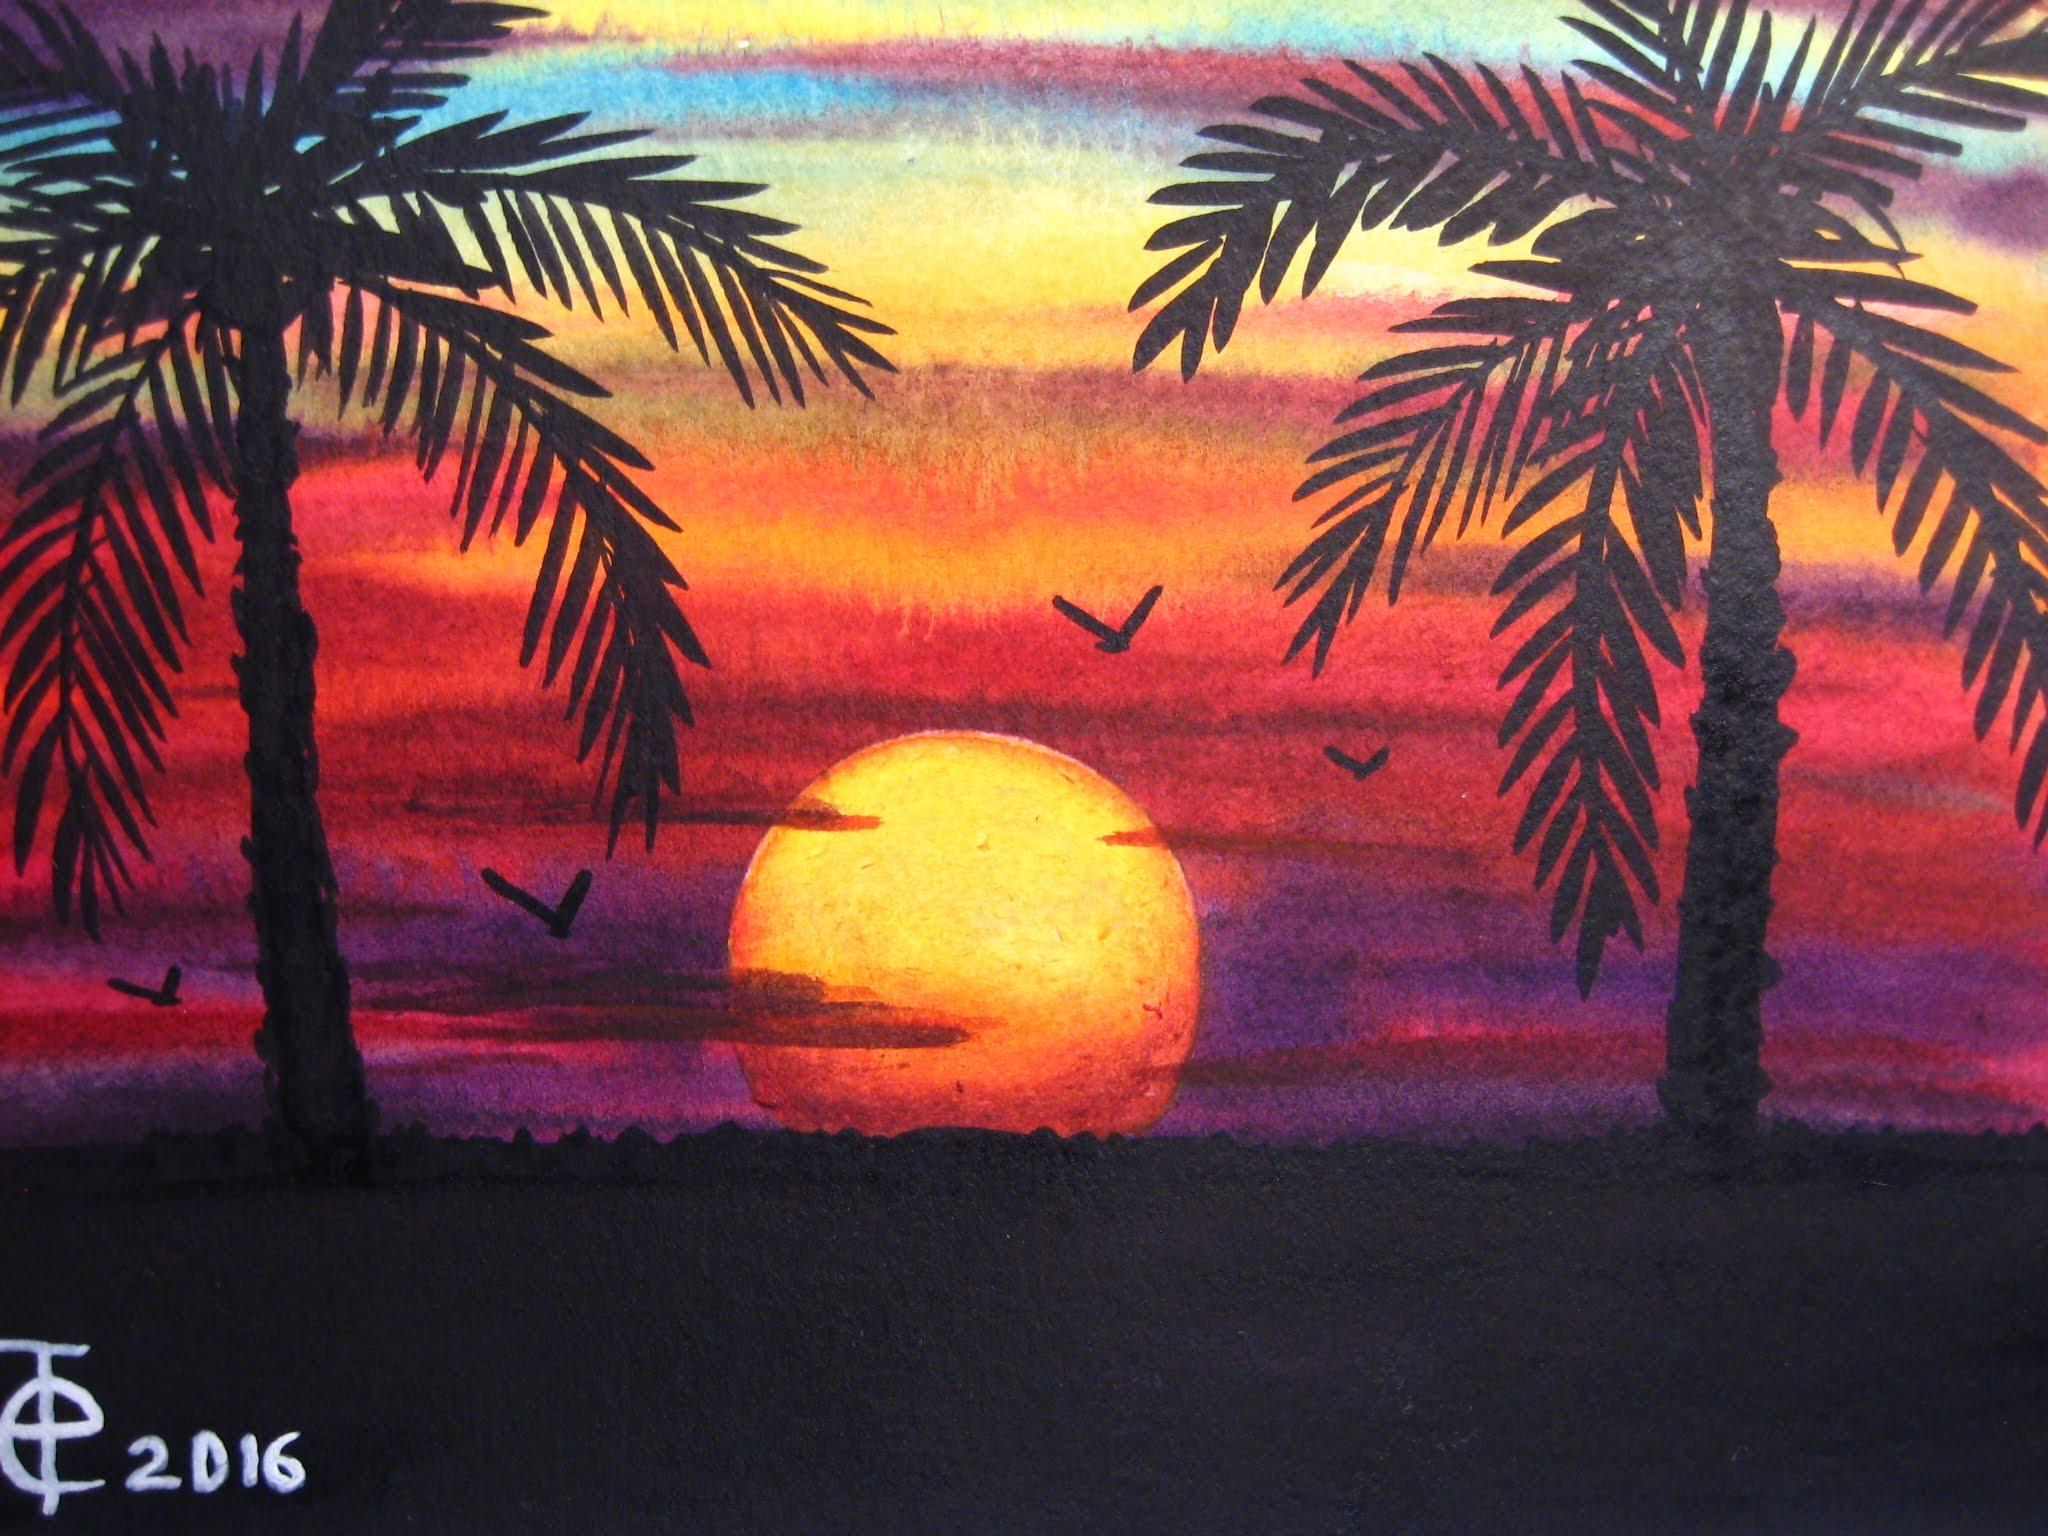 Drawn sunrise palm tree SUNSET WATERCOLOR PALM YouTube TREES